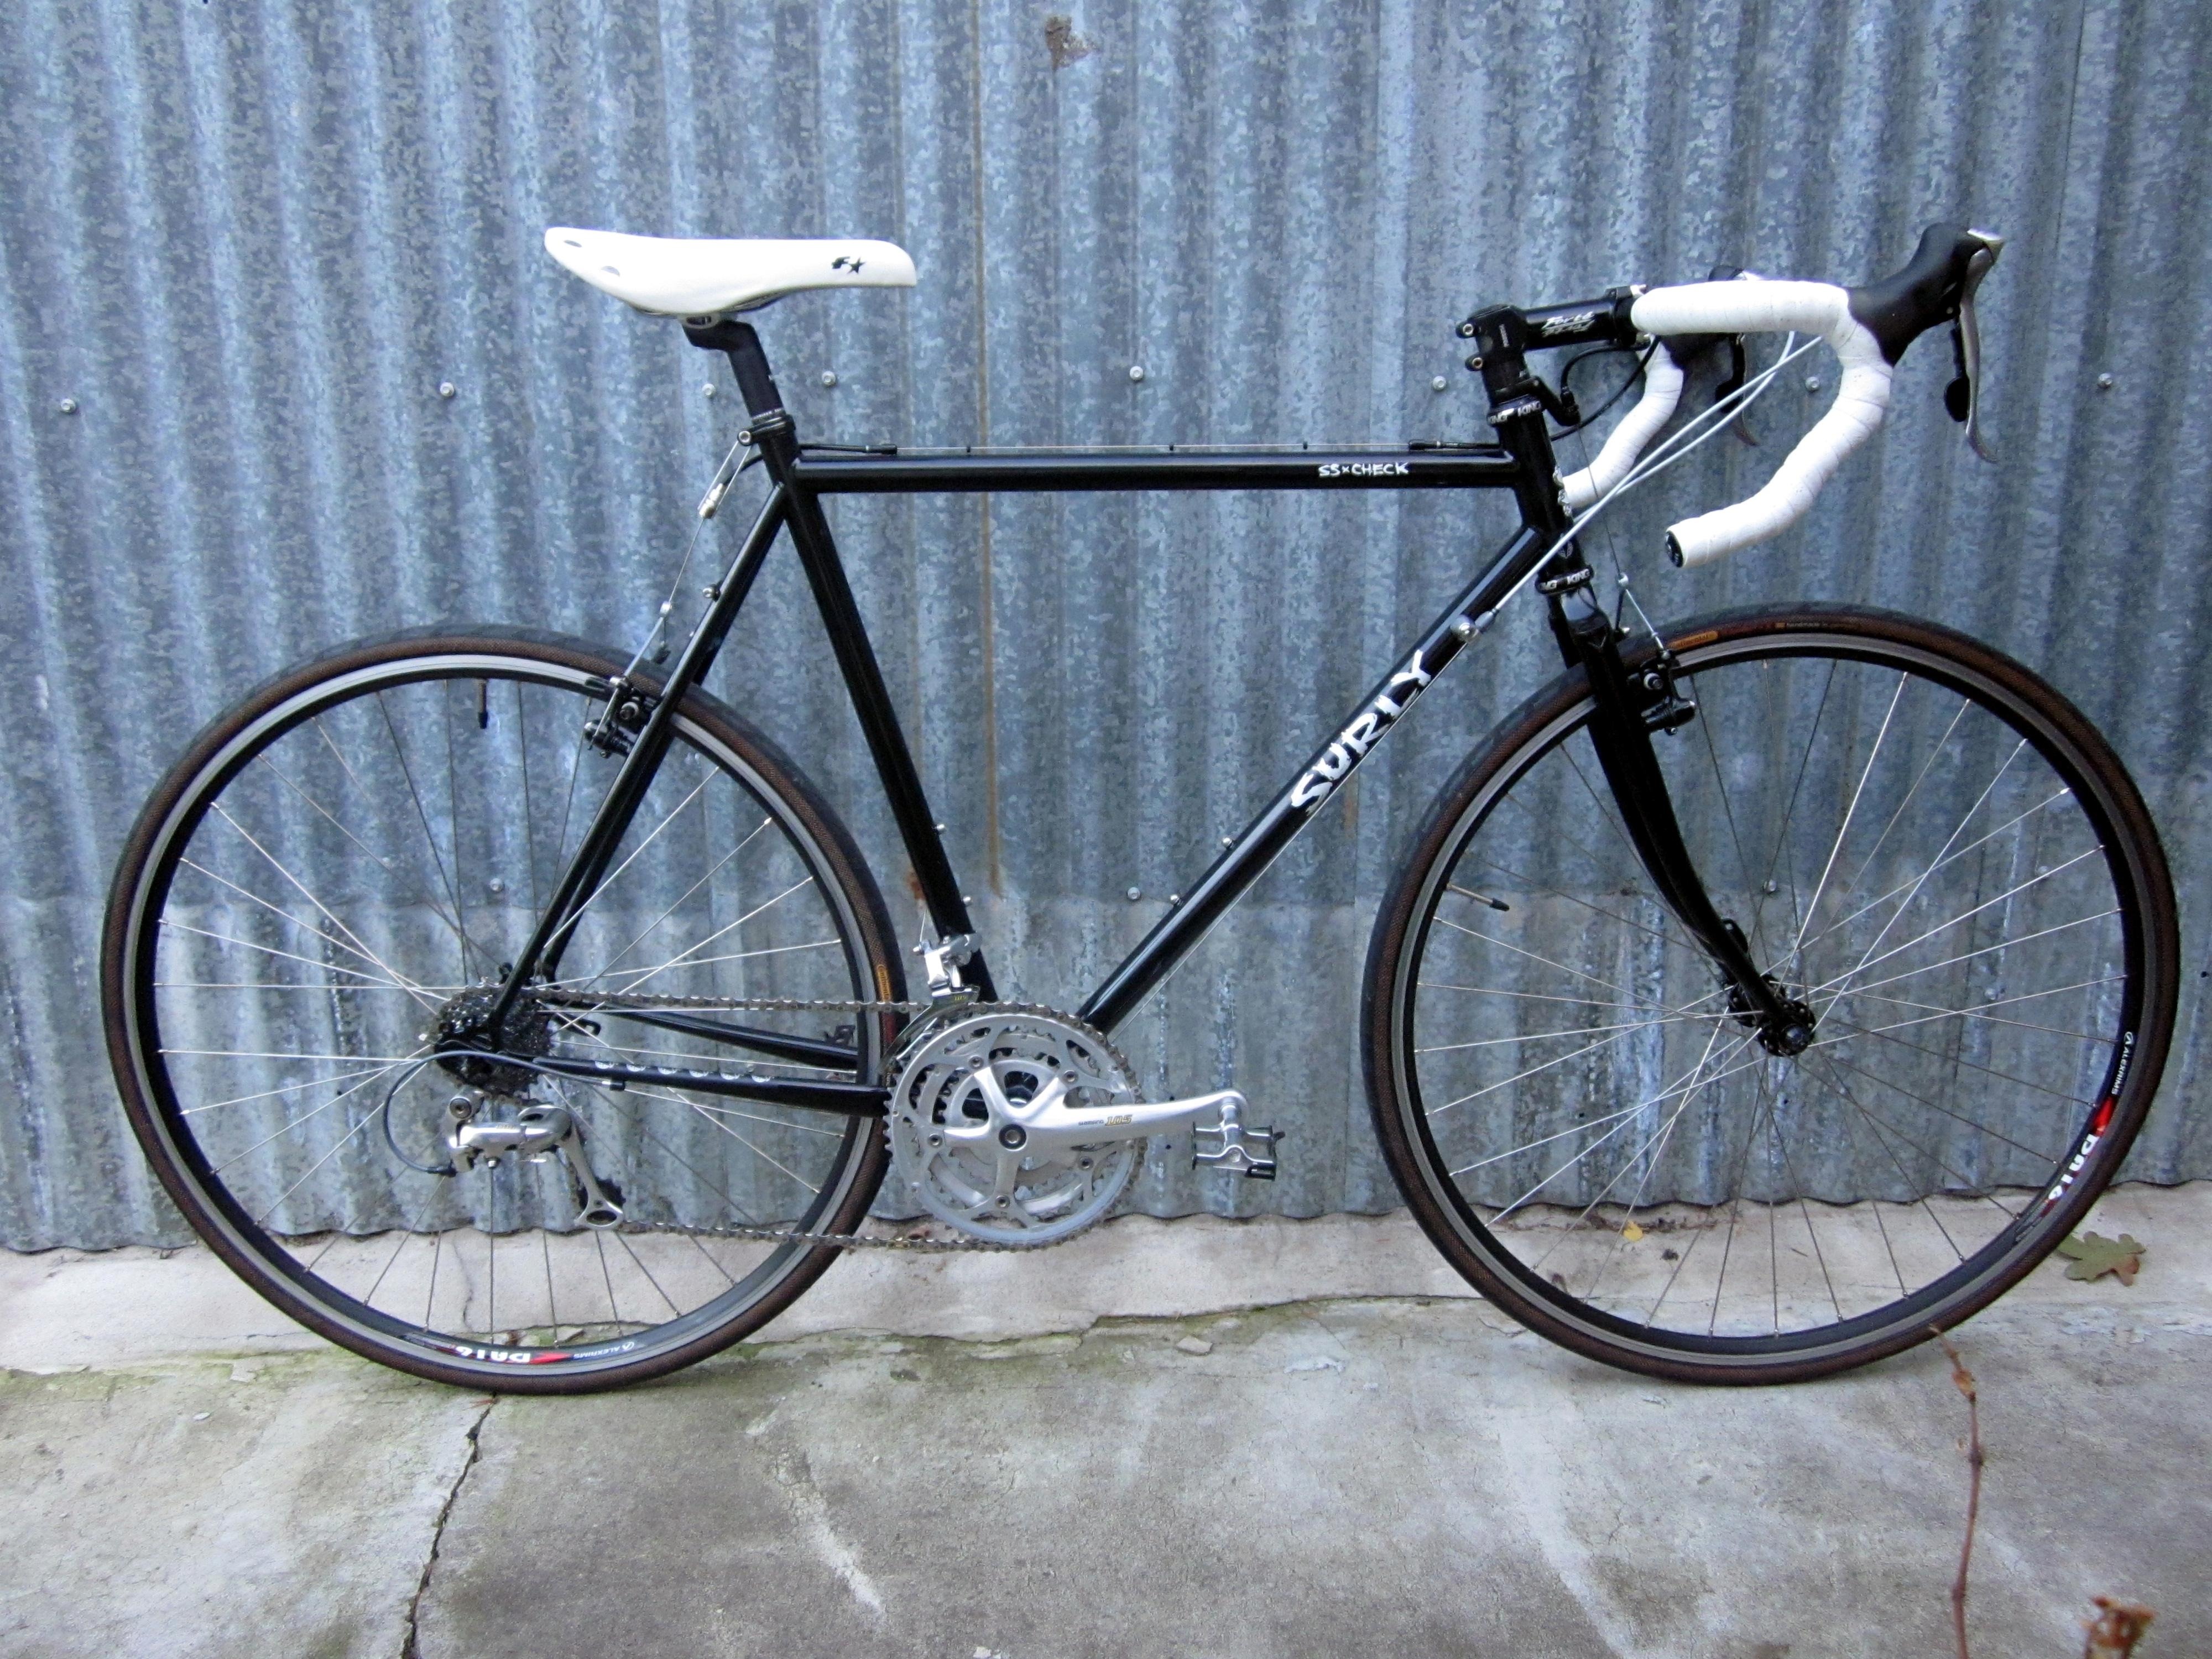 56cm Bike surly cm black